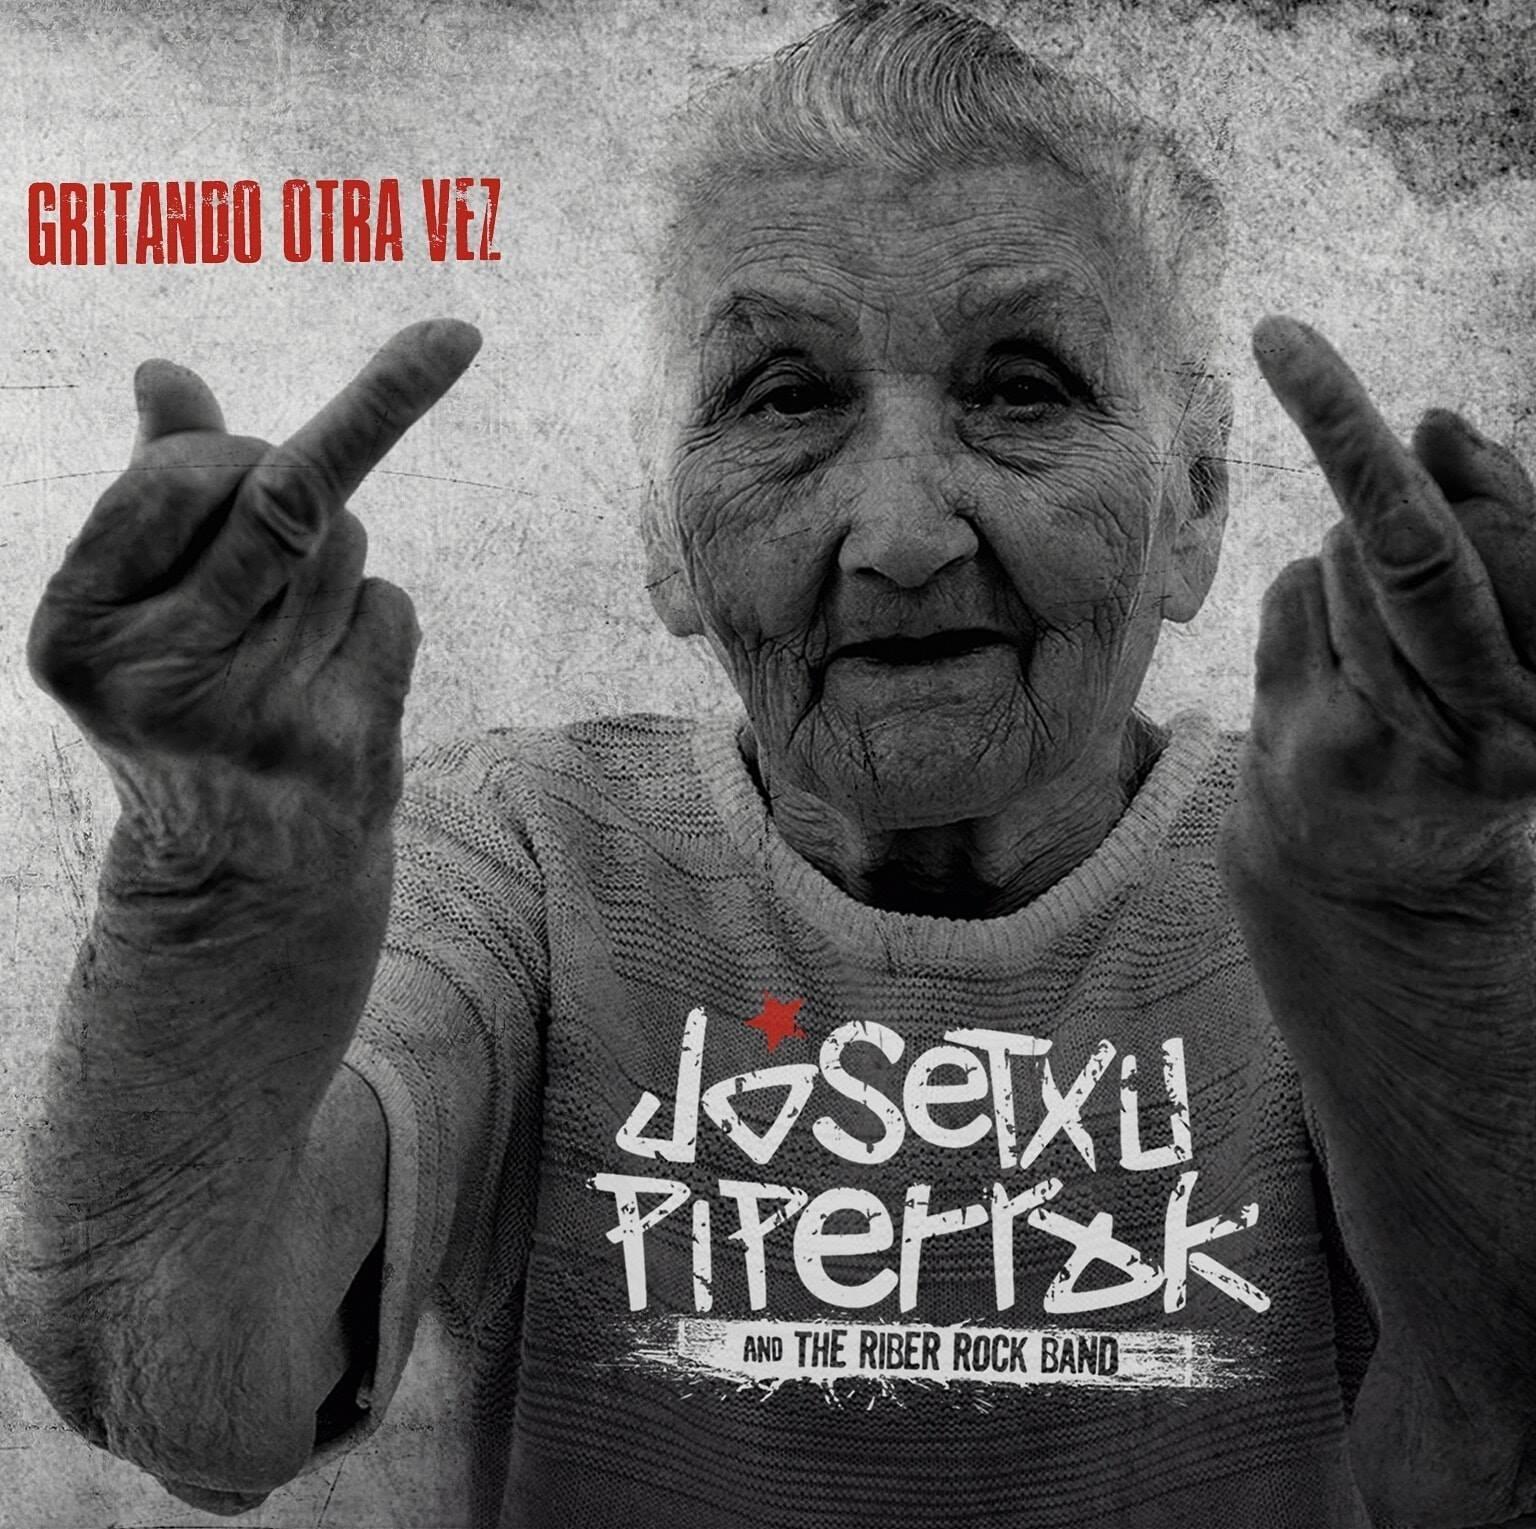 O.V.N.I., videoclip de Josetxu Piperrak & The Riber Rock Band, camino de las 100.000 reproducciones en Youtube